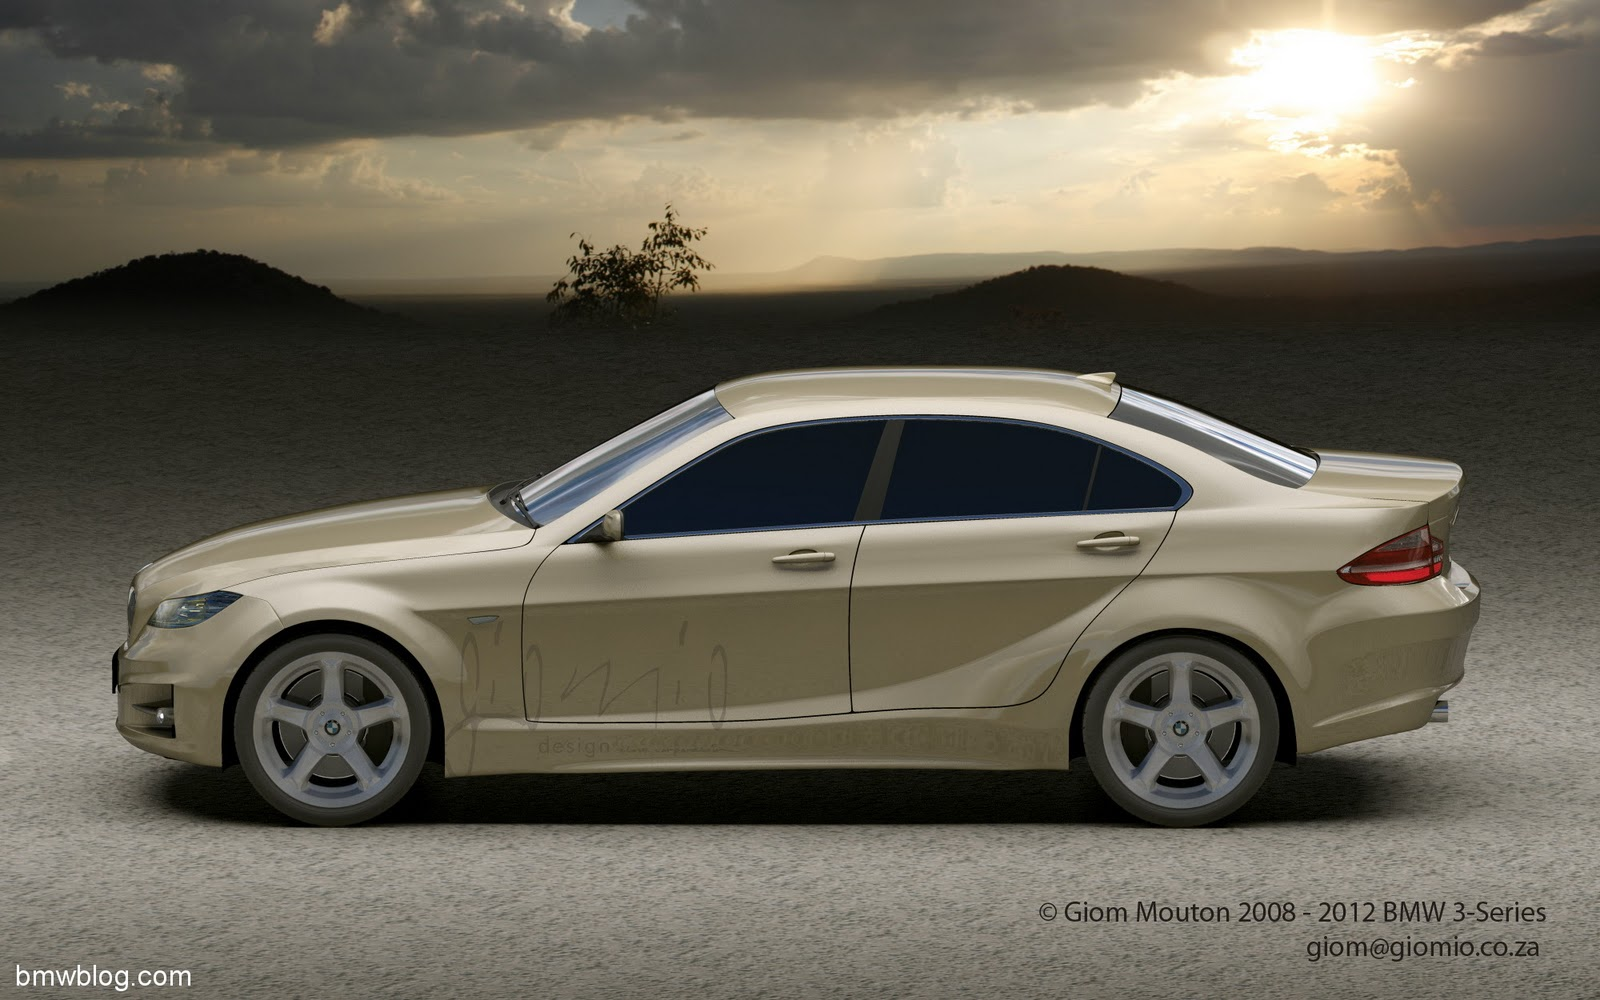 http://4.bp.blogspot.com/-GkraLLdijdU/TZyD8JJMfzI/AAAAAAAAANE/TMWi2ENKA4E/s1600/2012-BMW-3Series-2.jpg